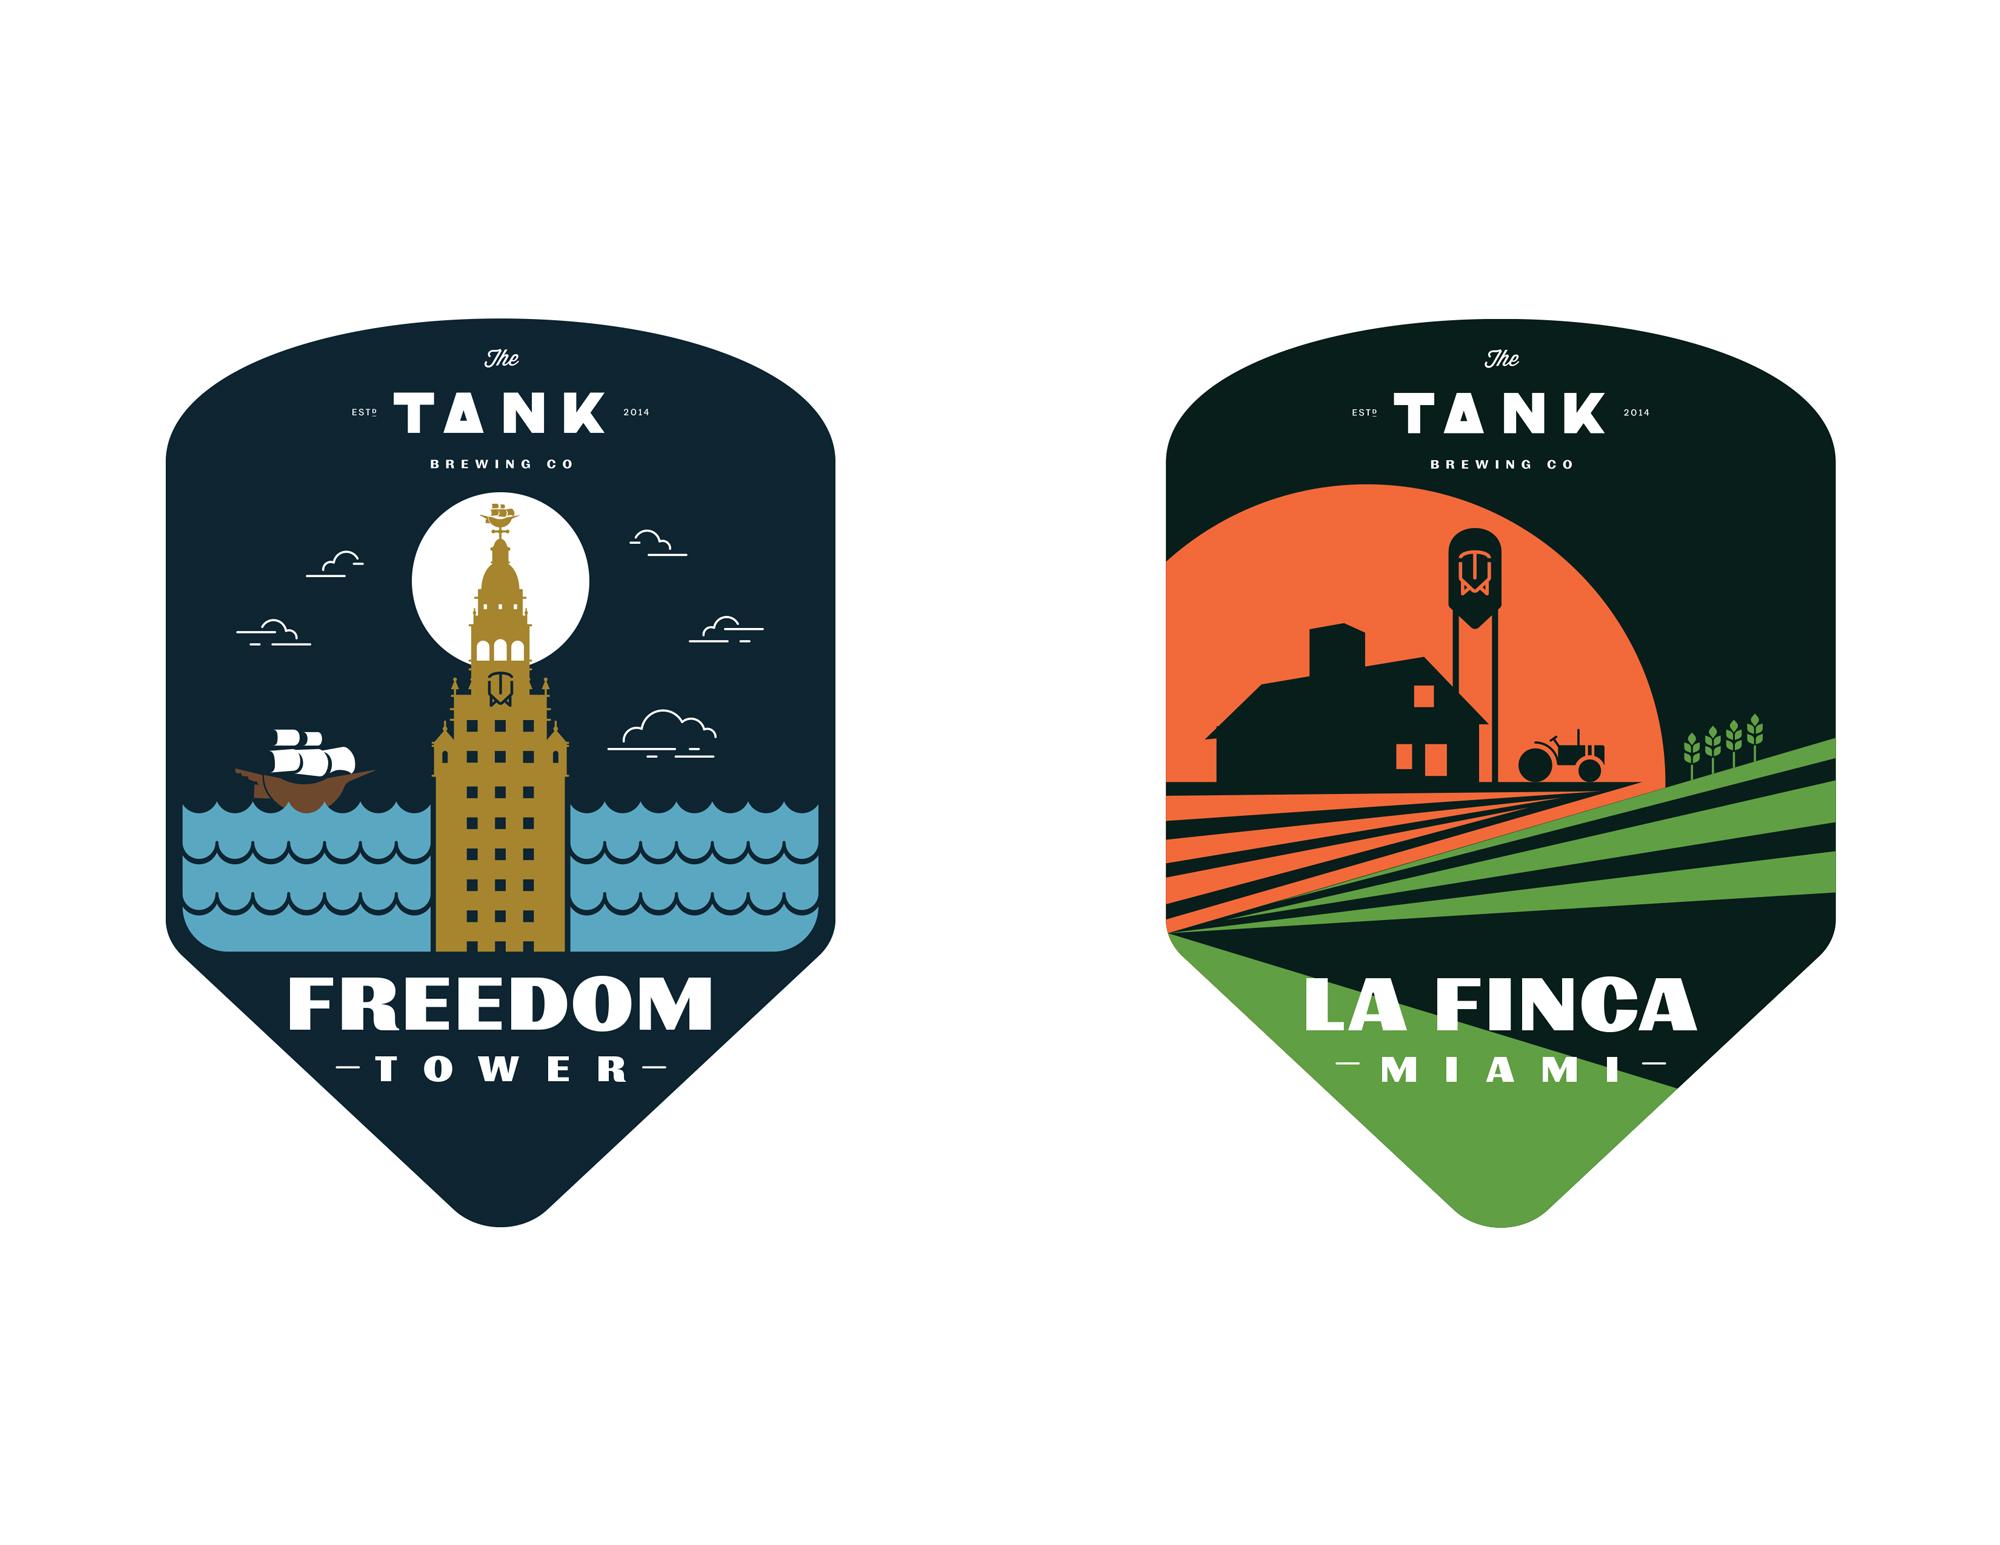 Tank labels 2